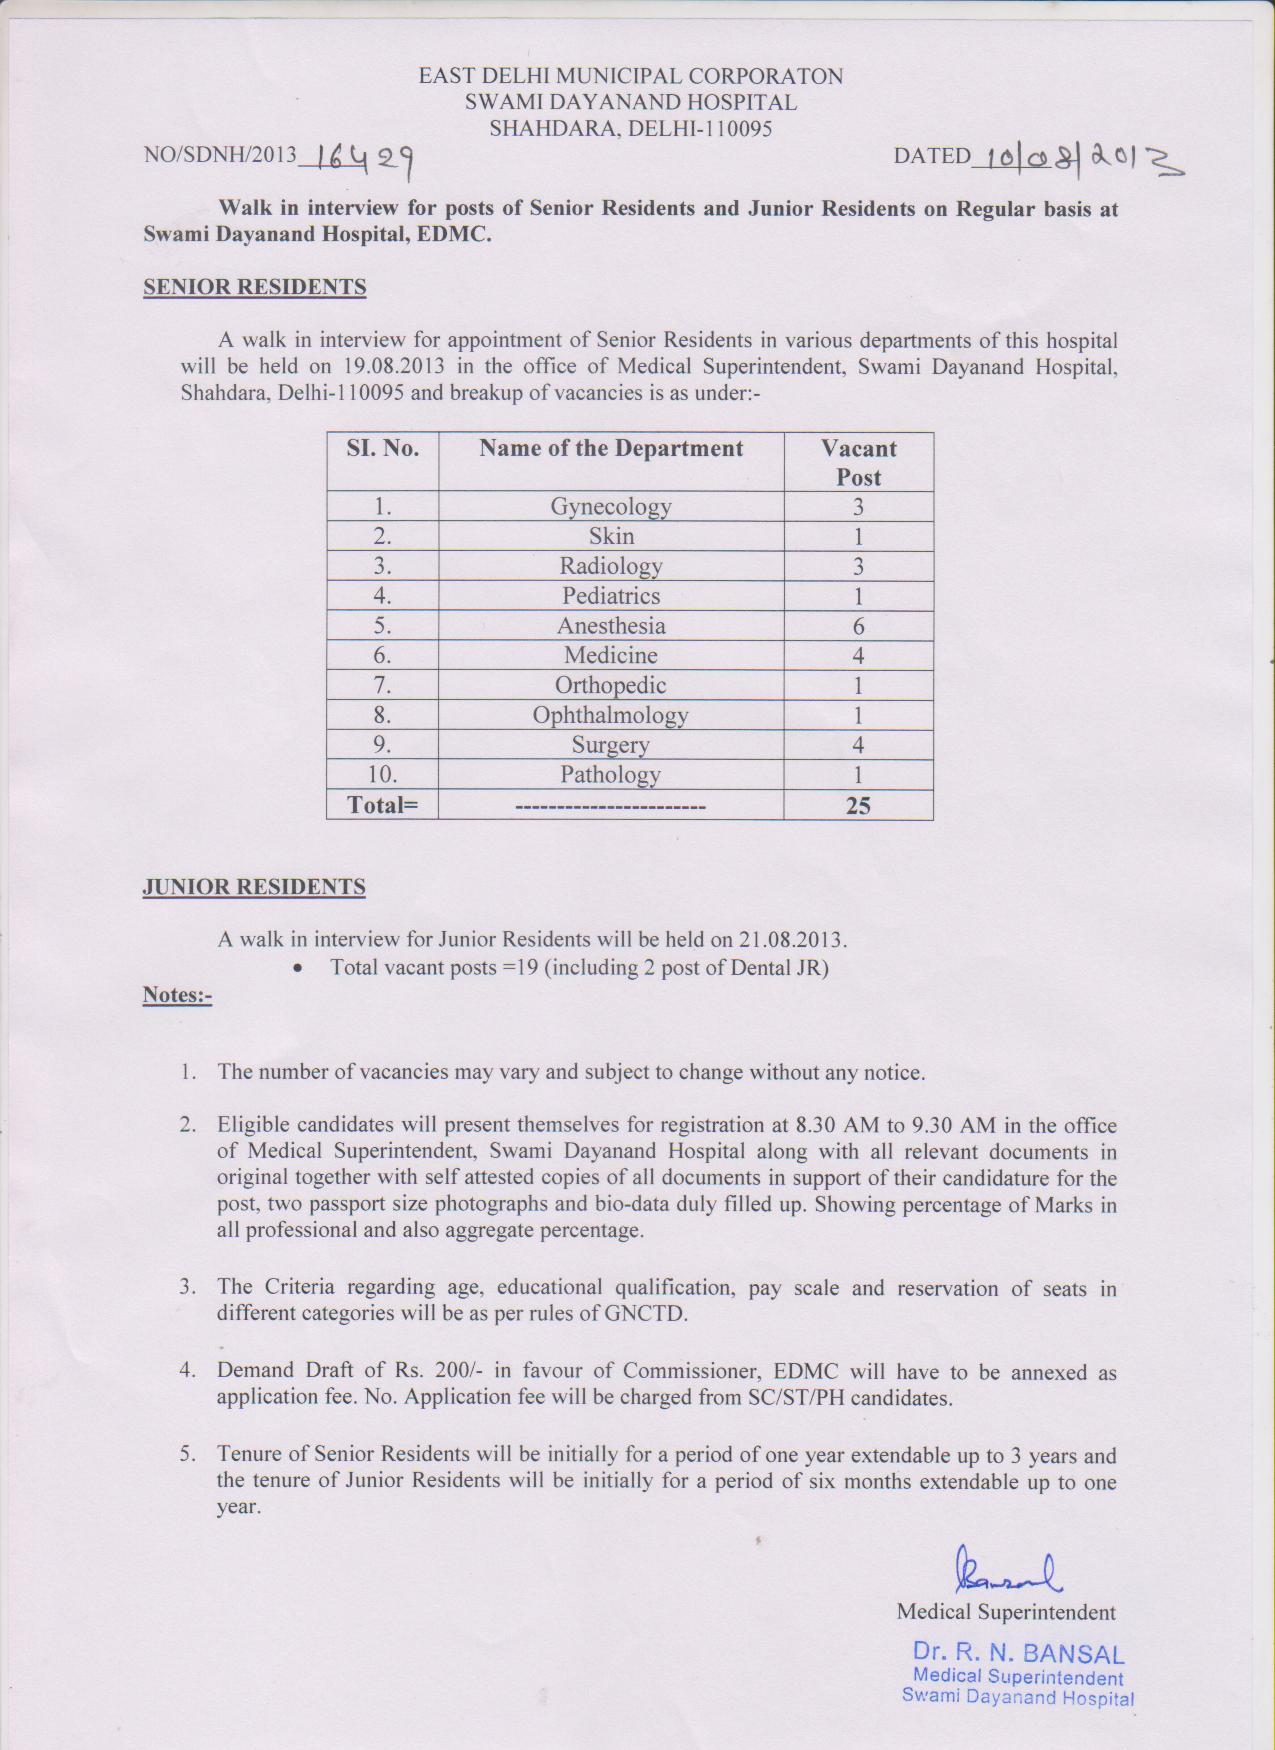 East Delhi Municipal Corporation Recruitment 2013 – Walk in for 44